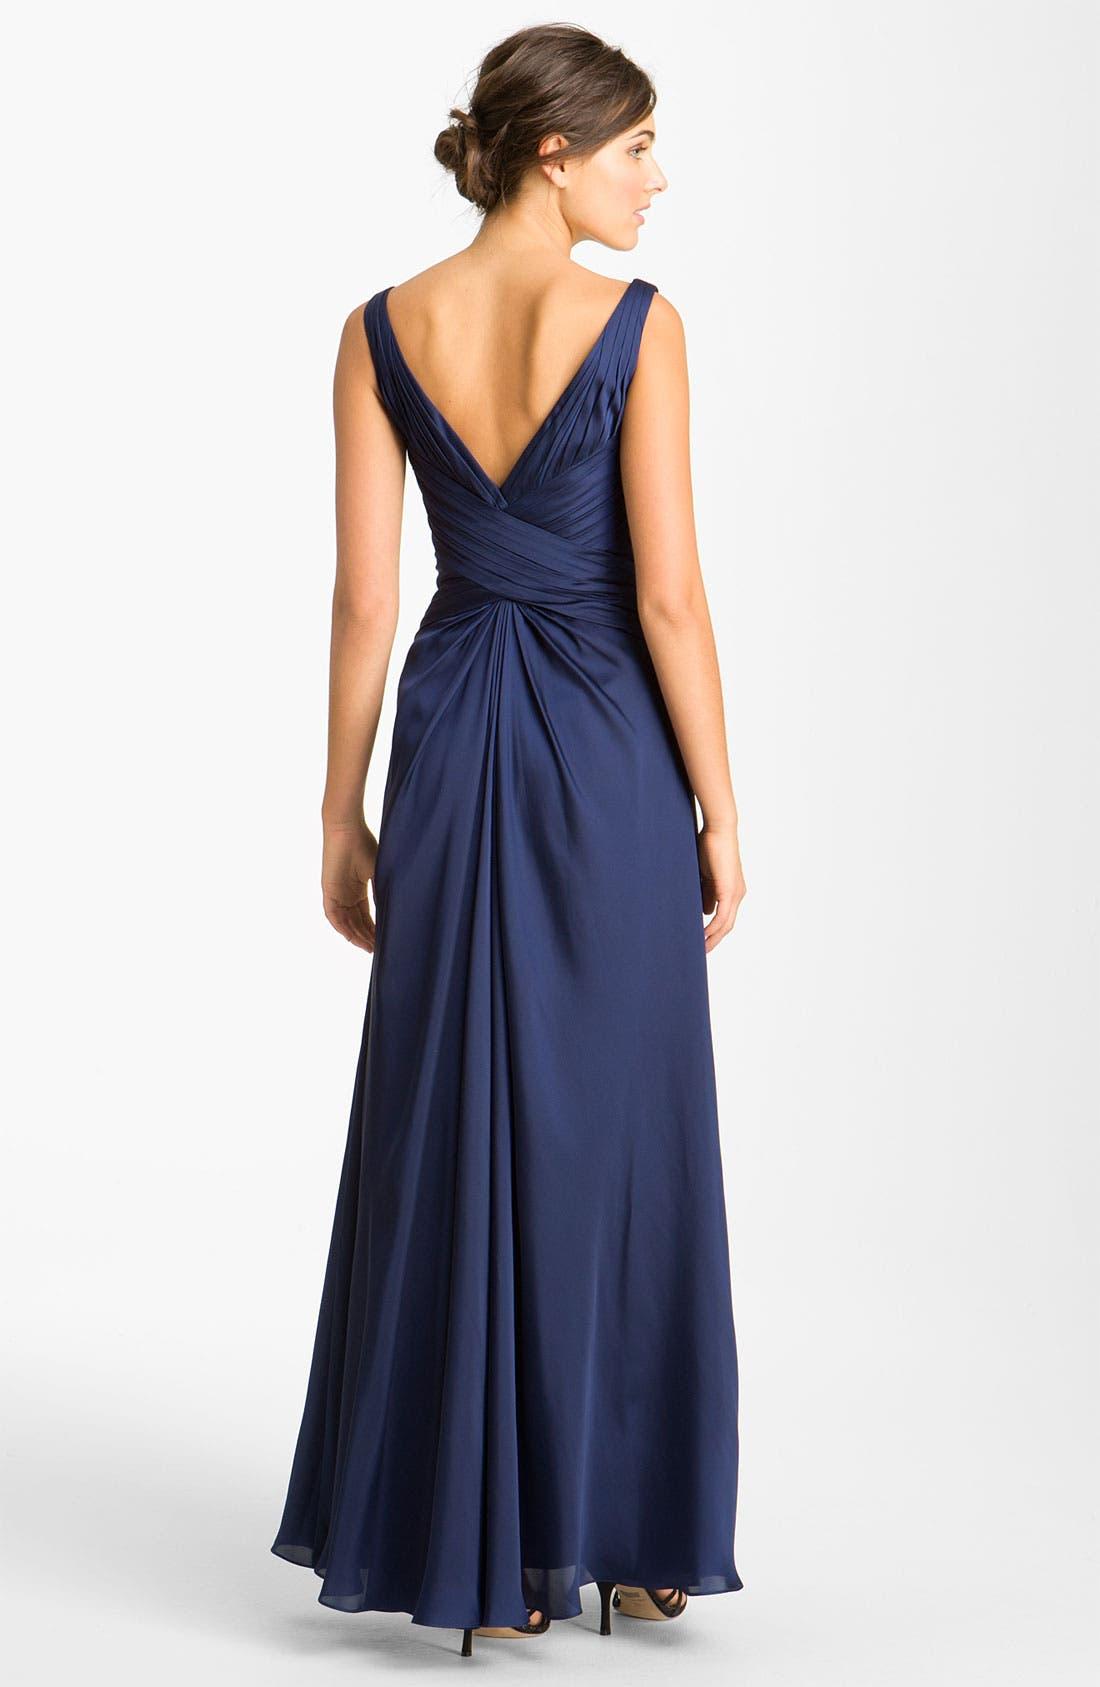 Alternate Image 2  - ML Monique Lhuillier Bridesmaids V-Neck Charmeuse Gown (Nordstrom Exclusive)